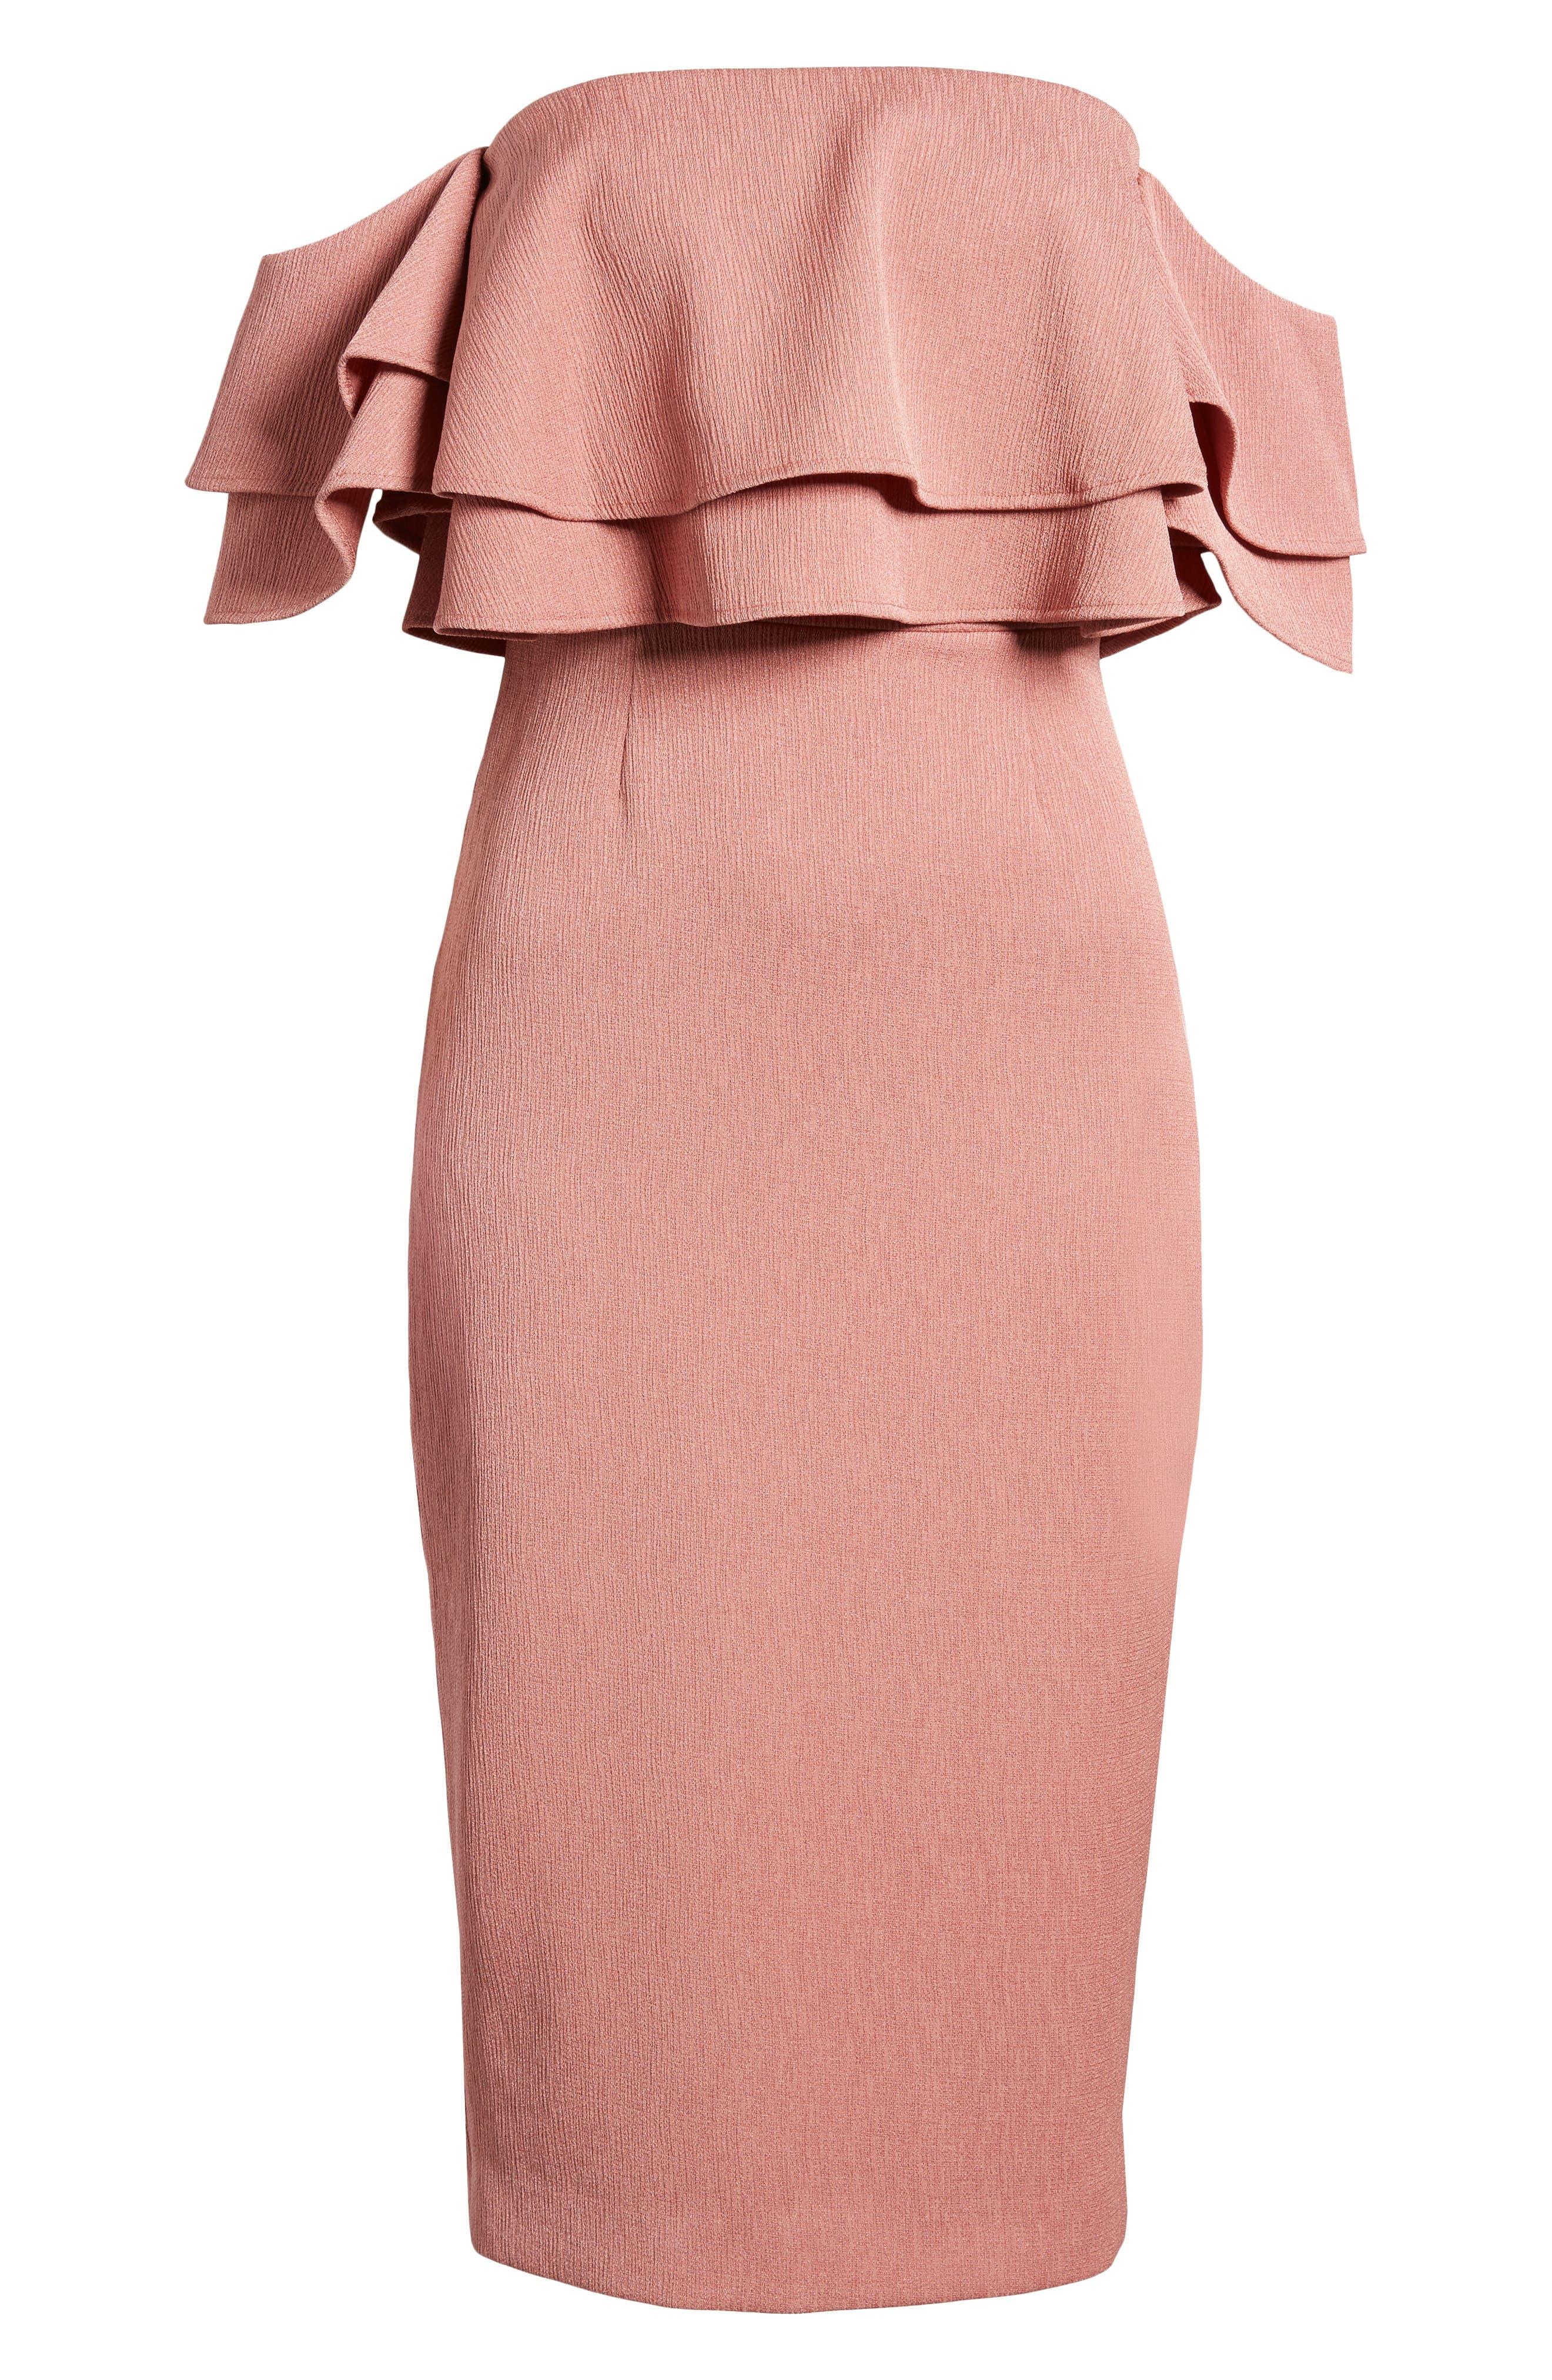 No Reason Off the Shoulder Sheath Dress,                             Alternate thumbnail 6, color,                             650